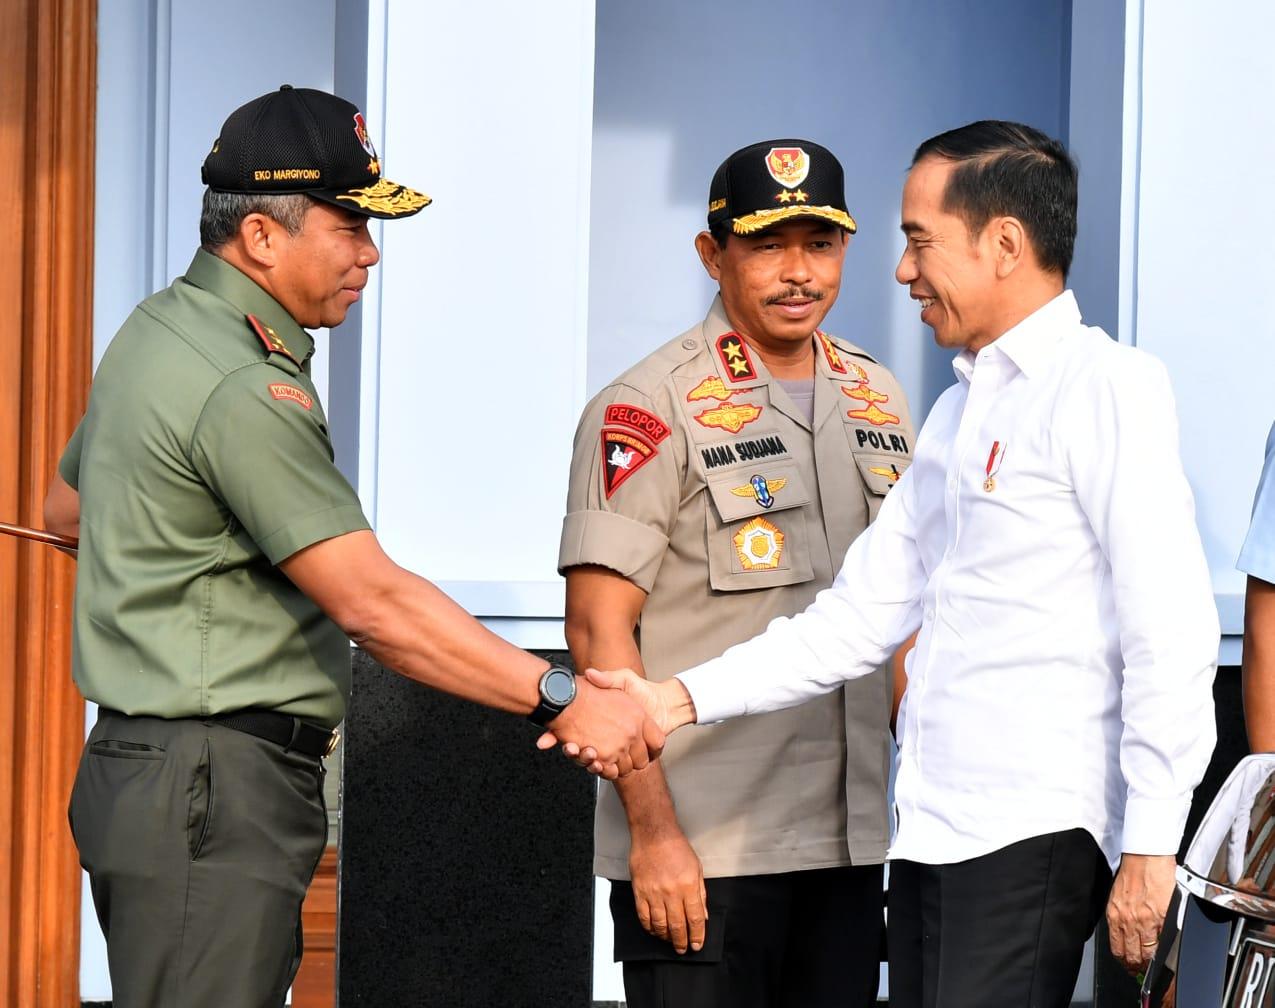 Bertolak ke Natuna, Presiden Dijadwalkan Bertemu Ratusan Nelayan 101